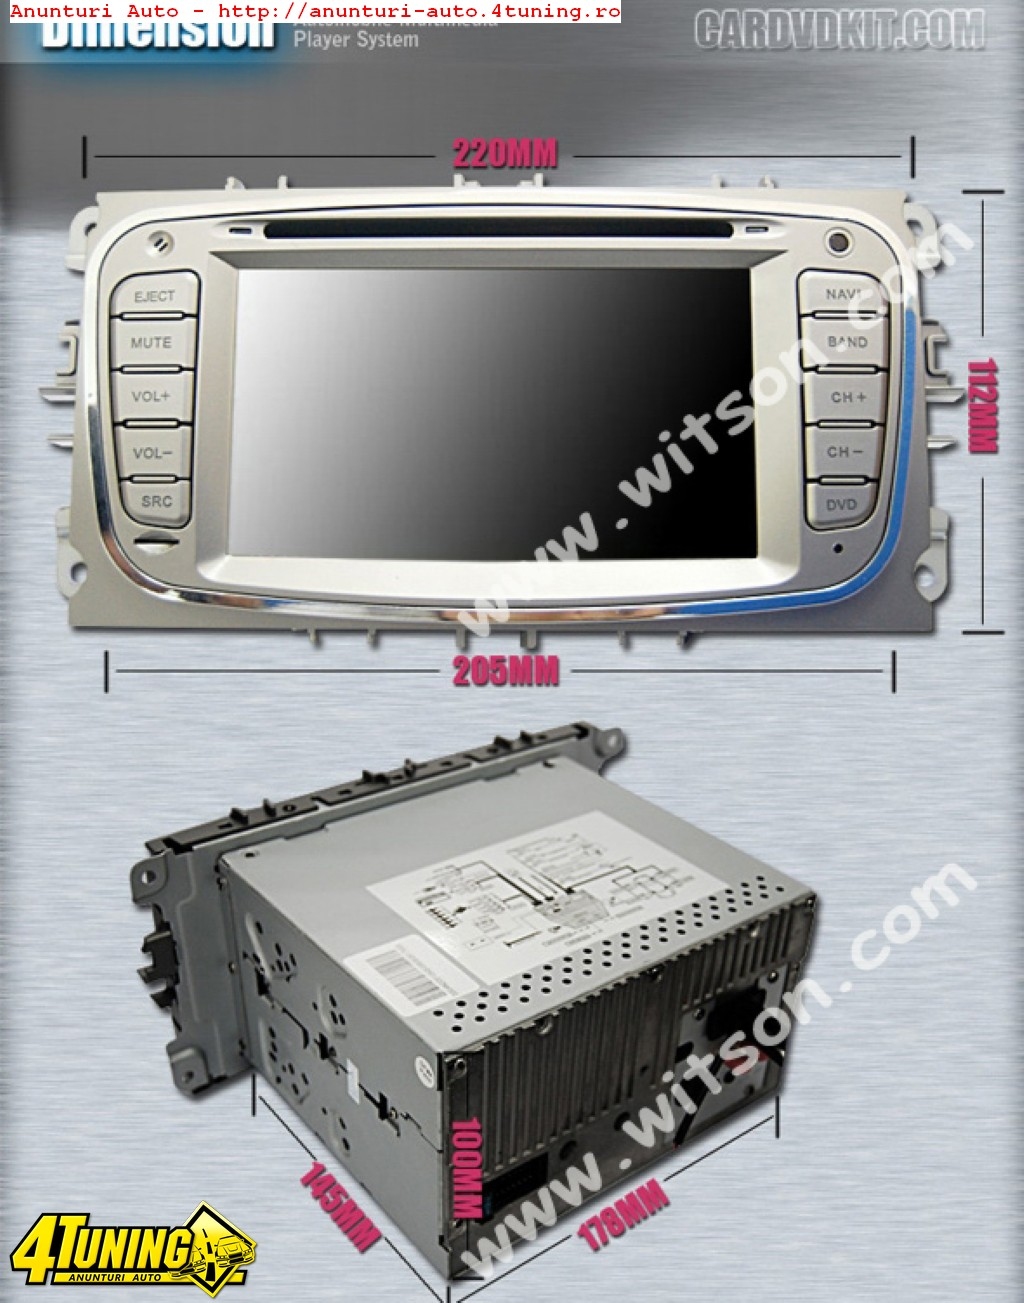 NAVIGATIE DEDICATA FORD MONDEO MK4 2007 - 2011 EDOTEC K003 PLATFORMA S90 ECRAN CAPACITIV